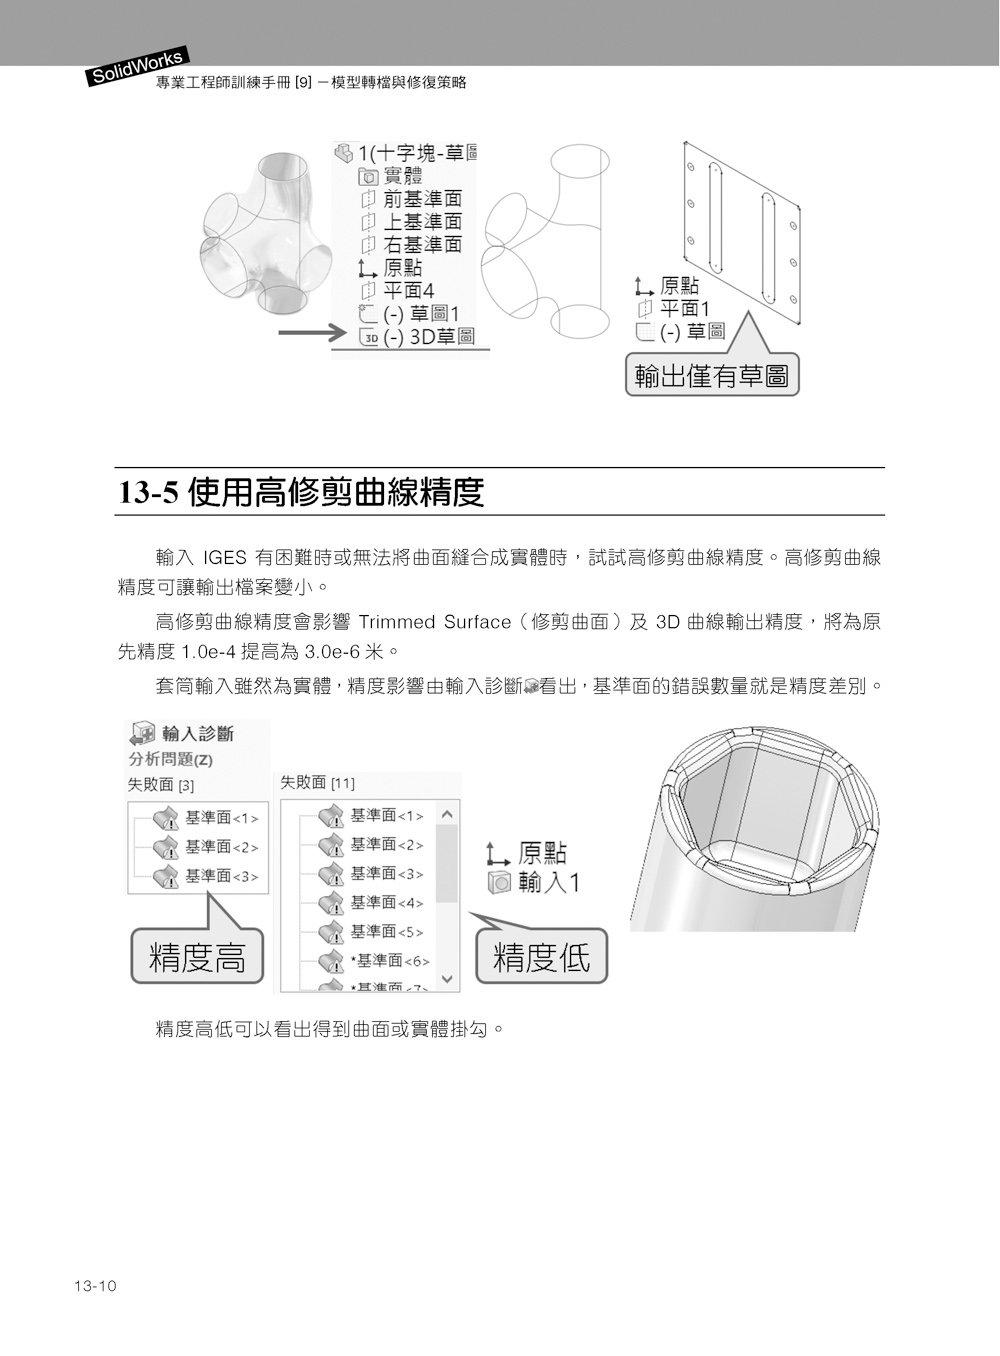 Solidworks 專業工程師訓練手冊[9]-模型轉檔與修復策略-preview-23